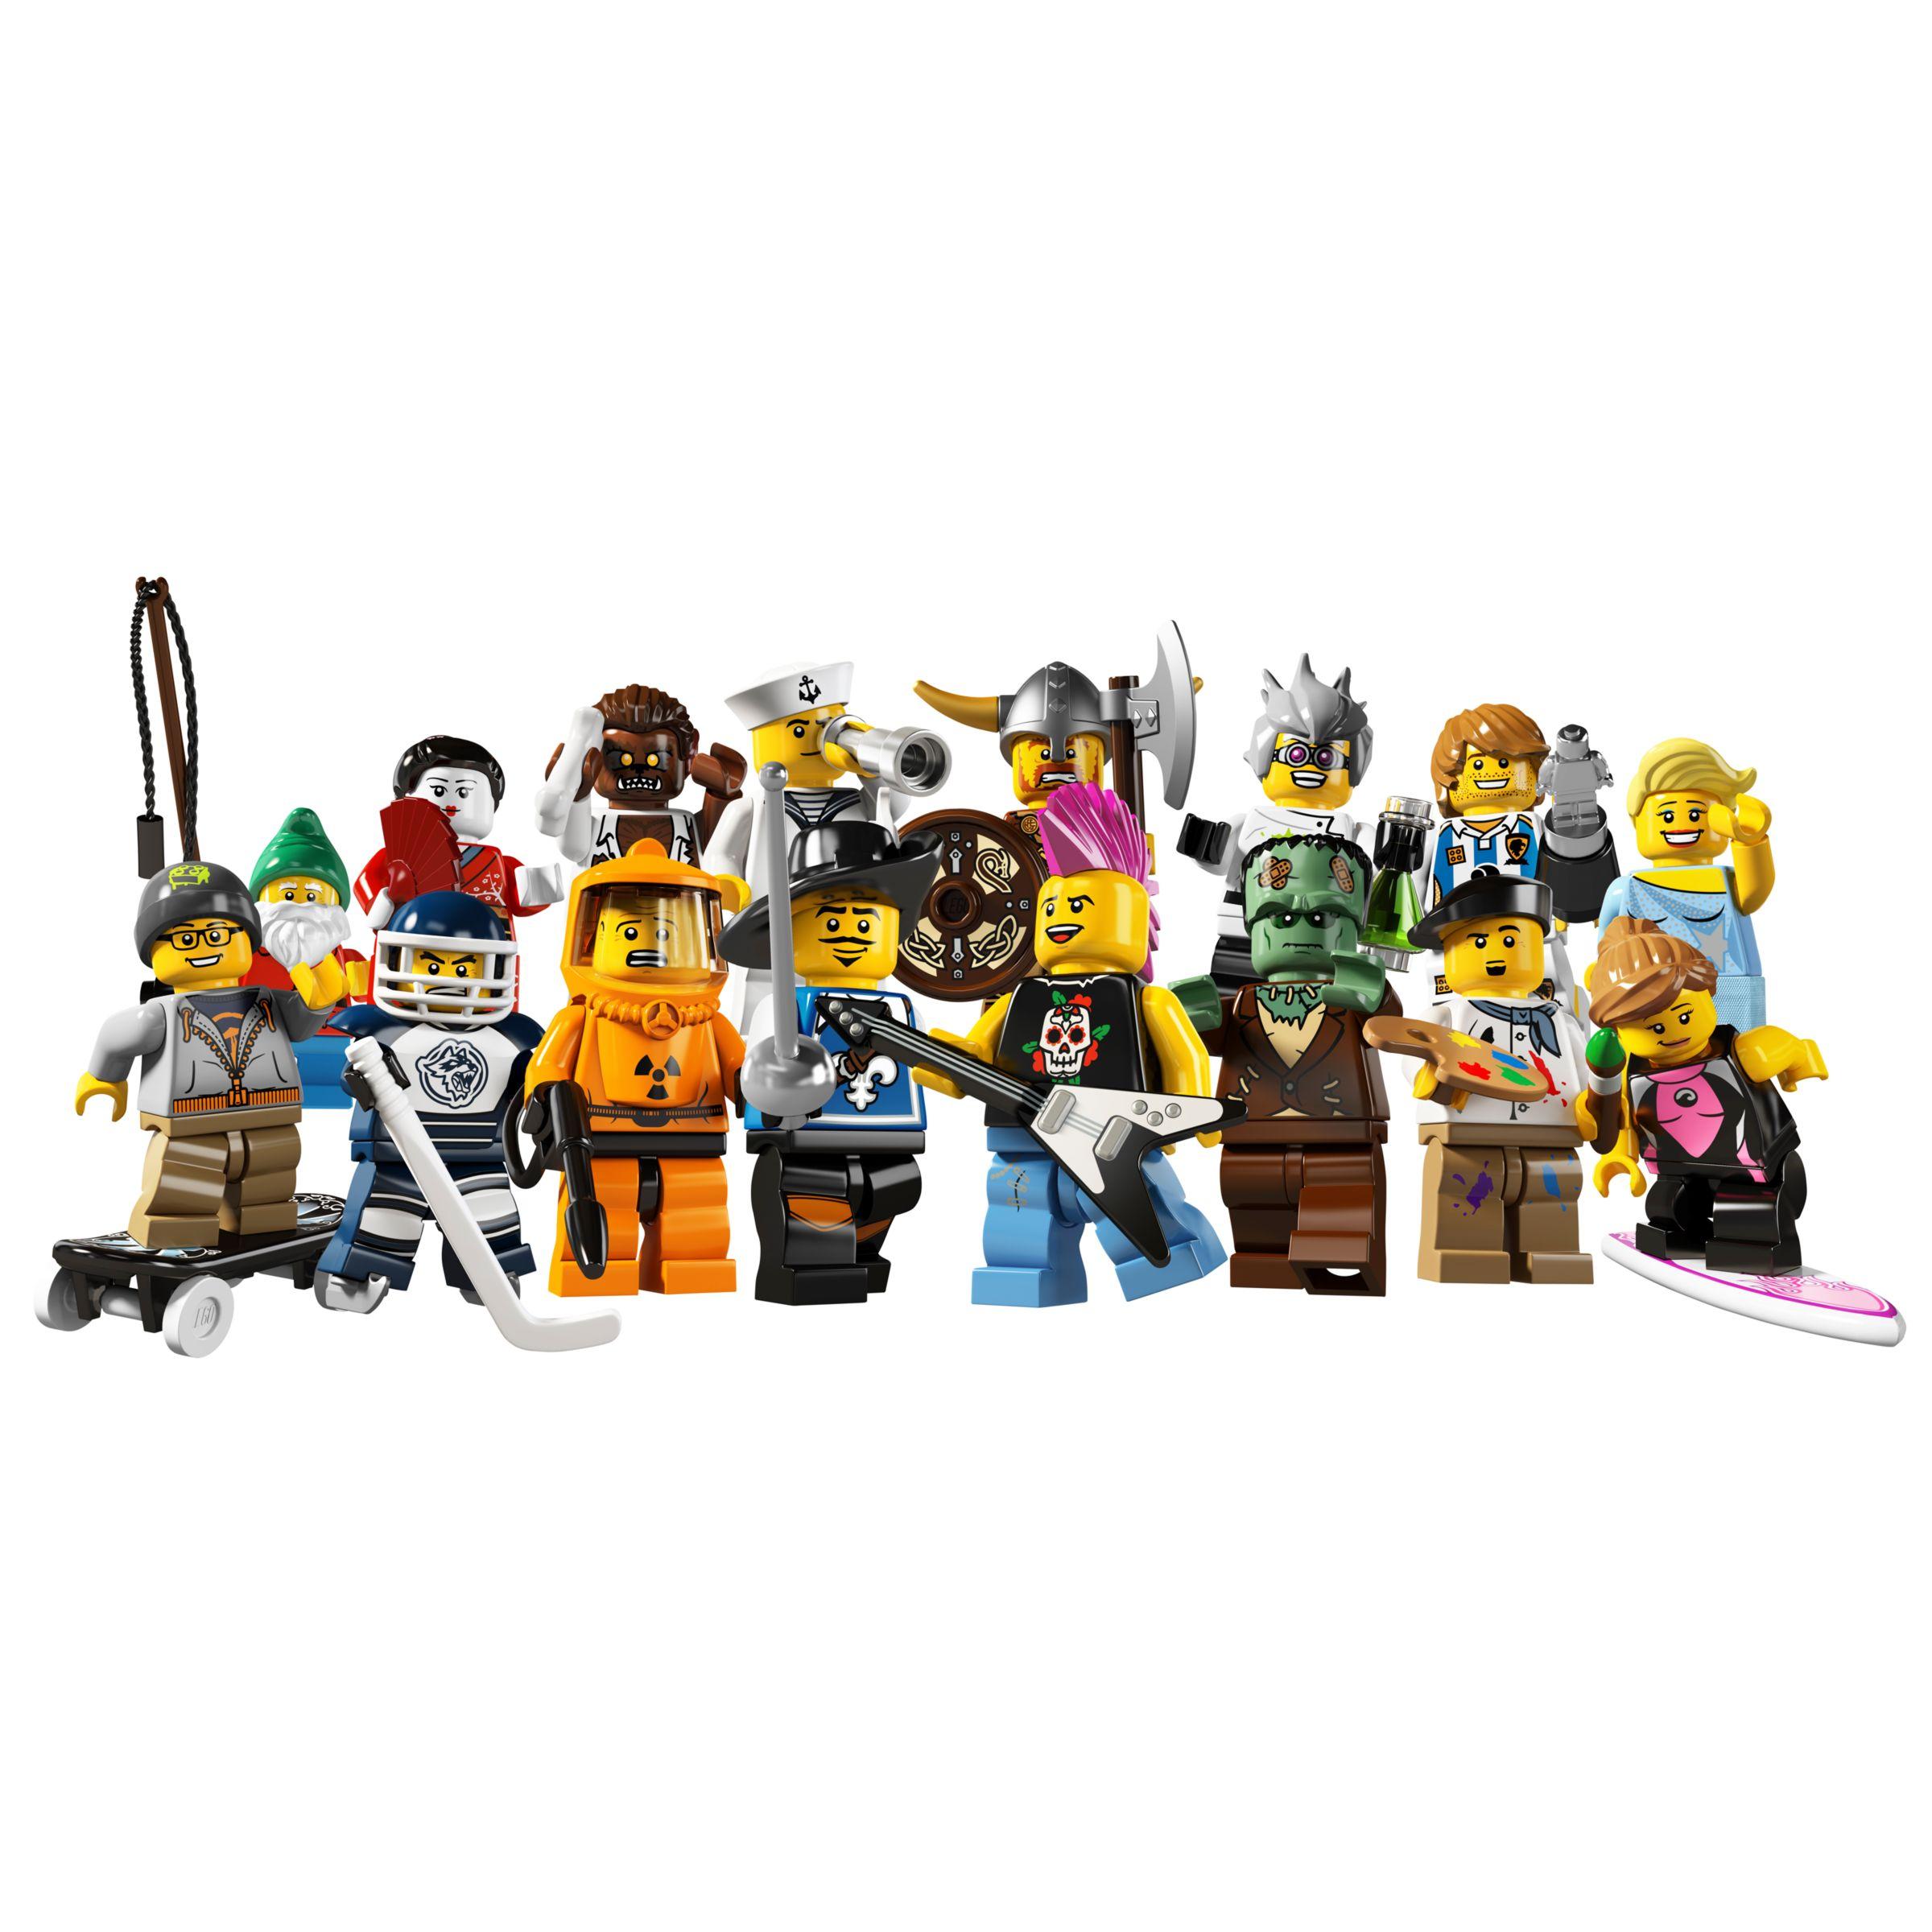 Lego Mini Figures, Series 4